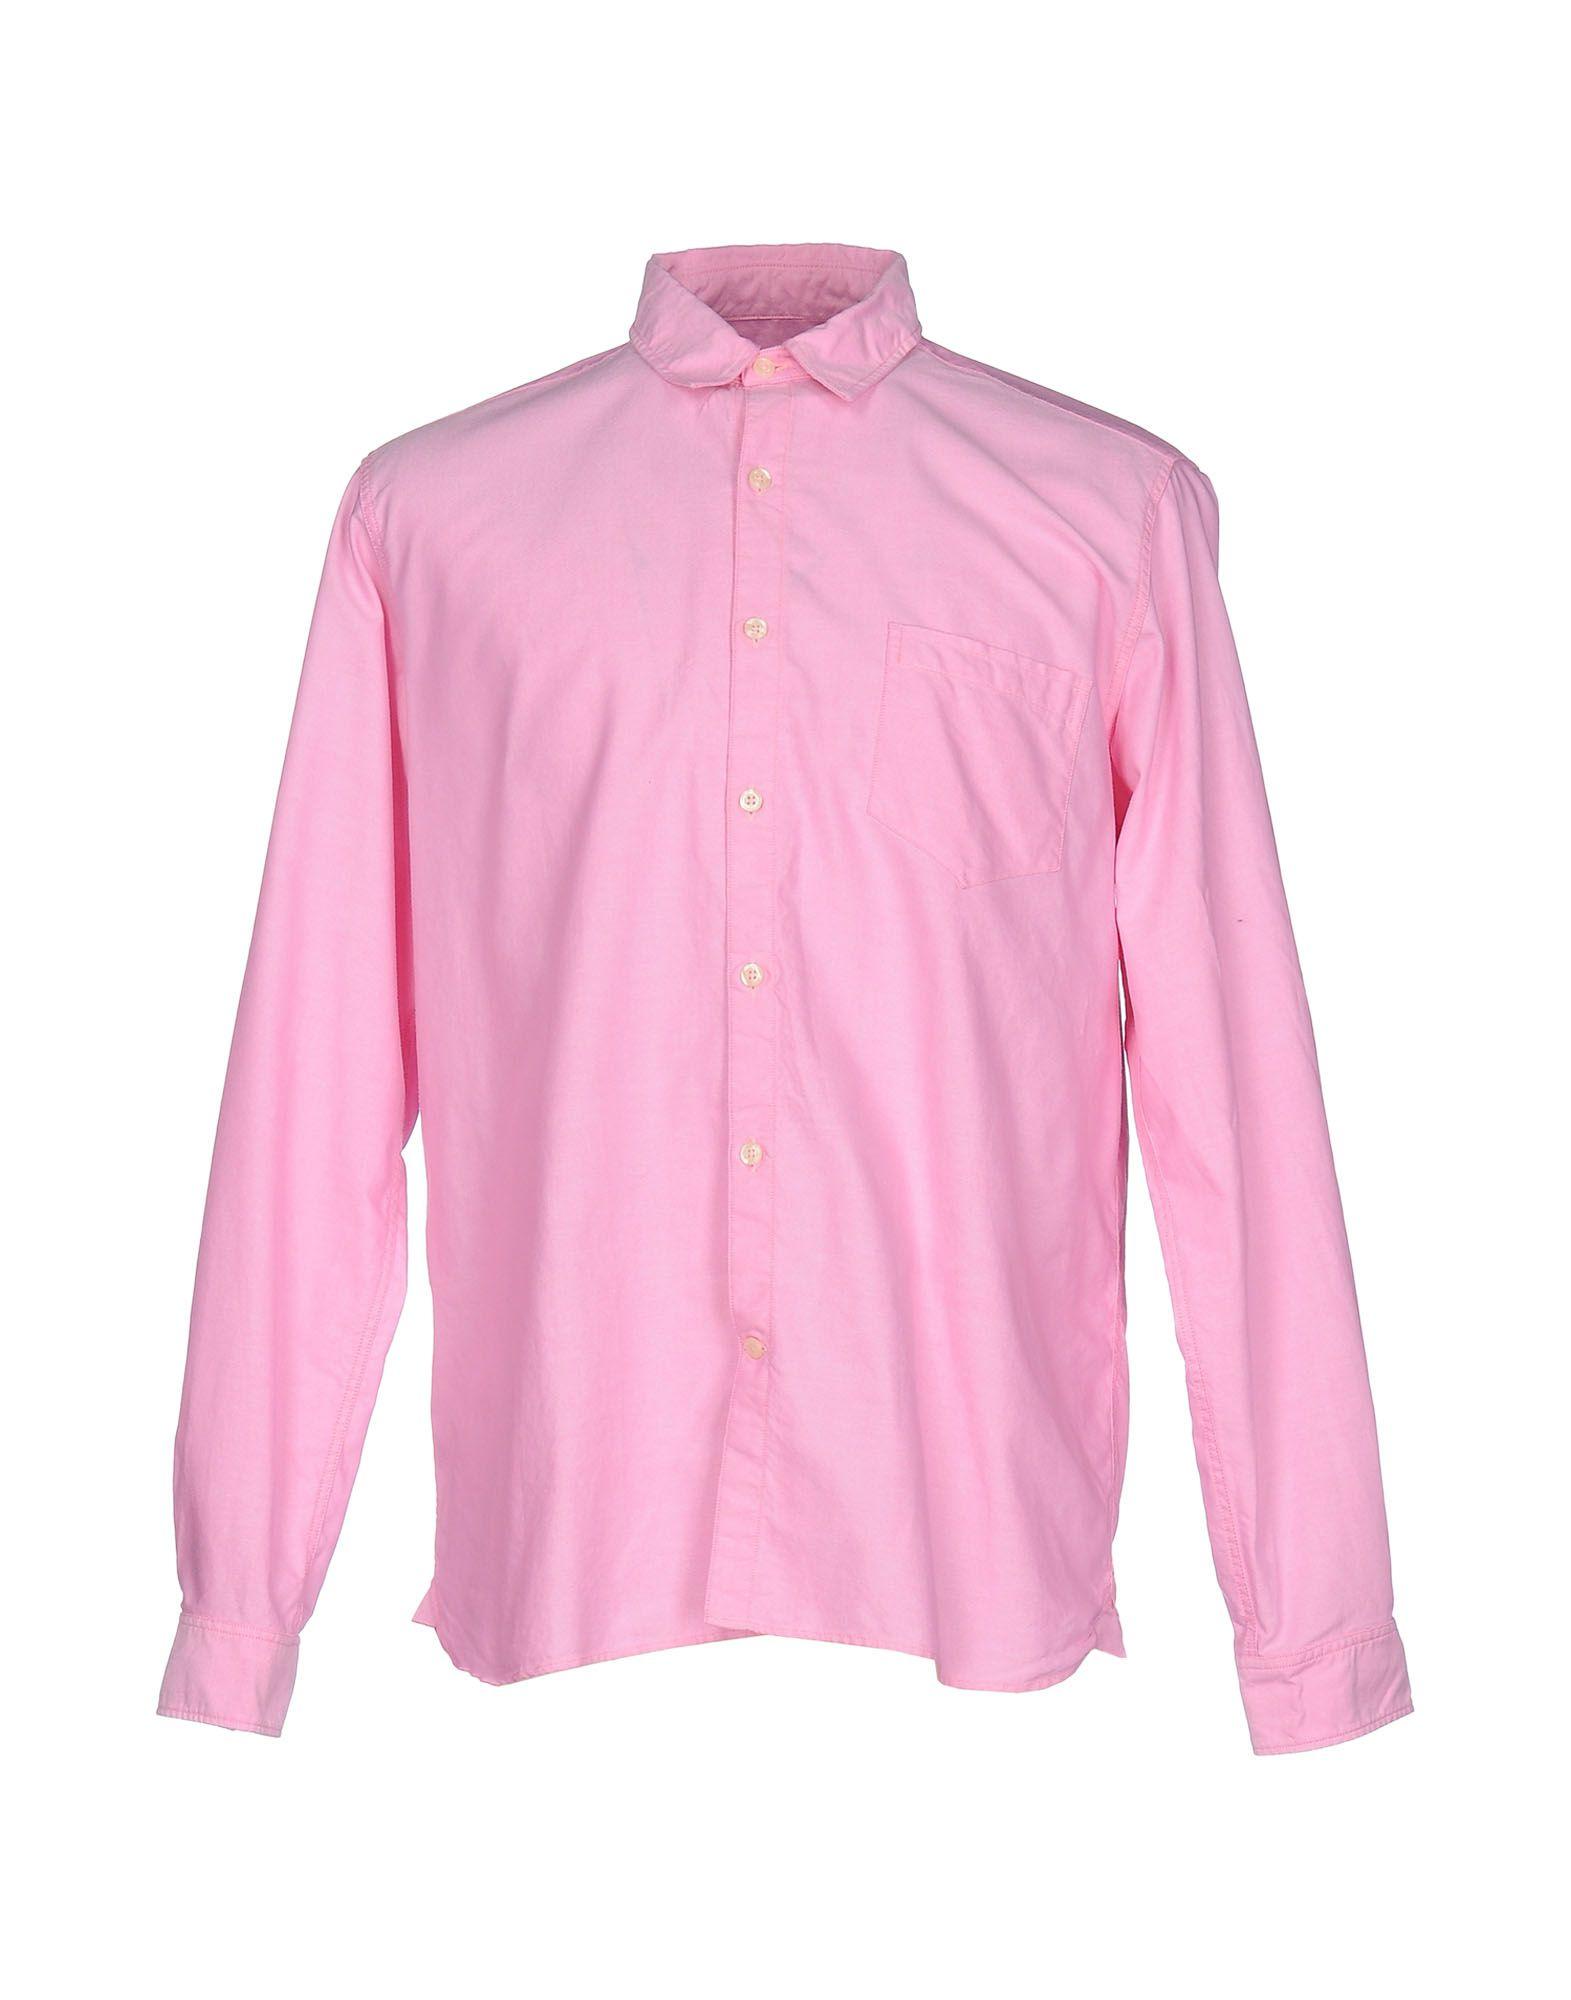 F.S.C. FREEMANS SPORTING CLUB Pубашка стоимость